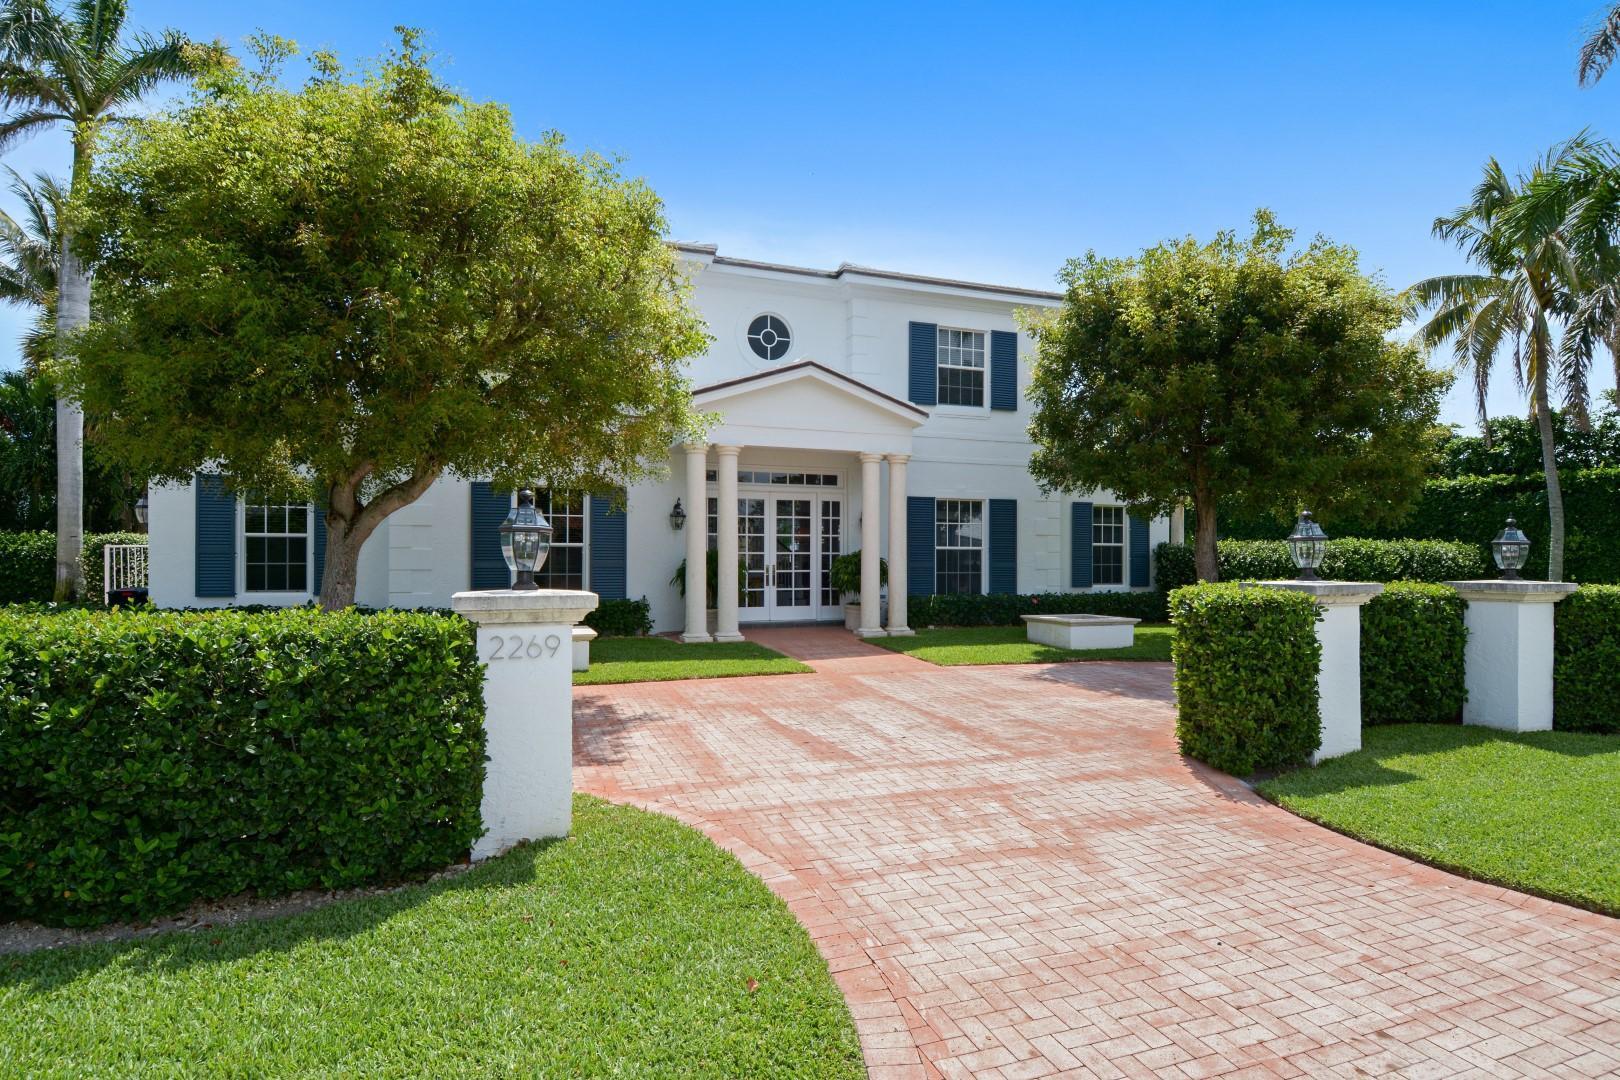 2269 Ibis Isle Road, Palm Beach, Florida 33480, 4 Bedrooms Bedrooms, ,3.1 BathroomsBathrooms,Single Family,For Sale,Ibis Isle,RX-10428570